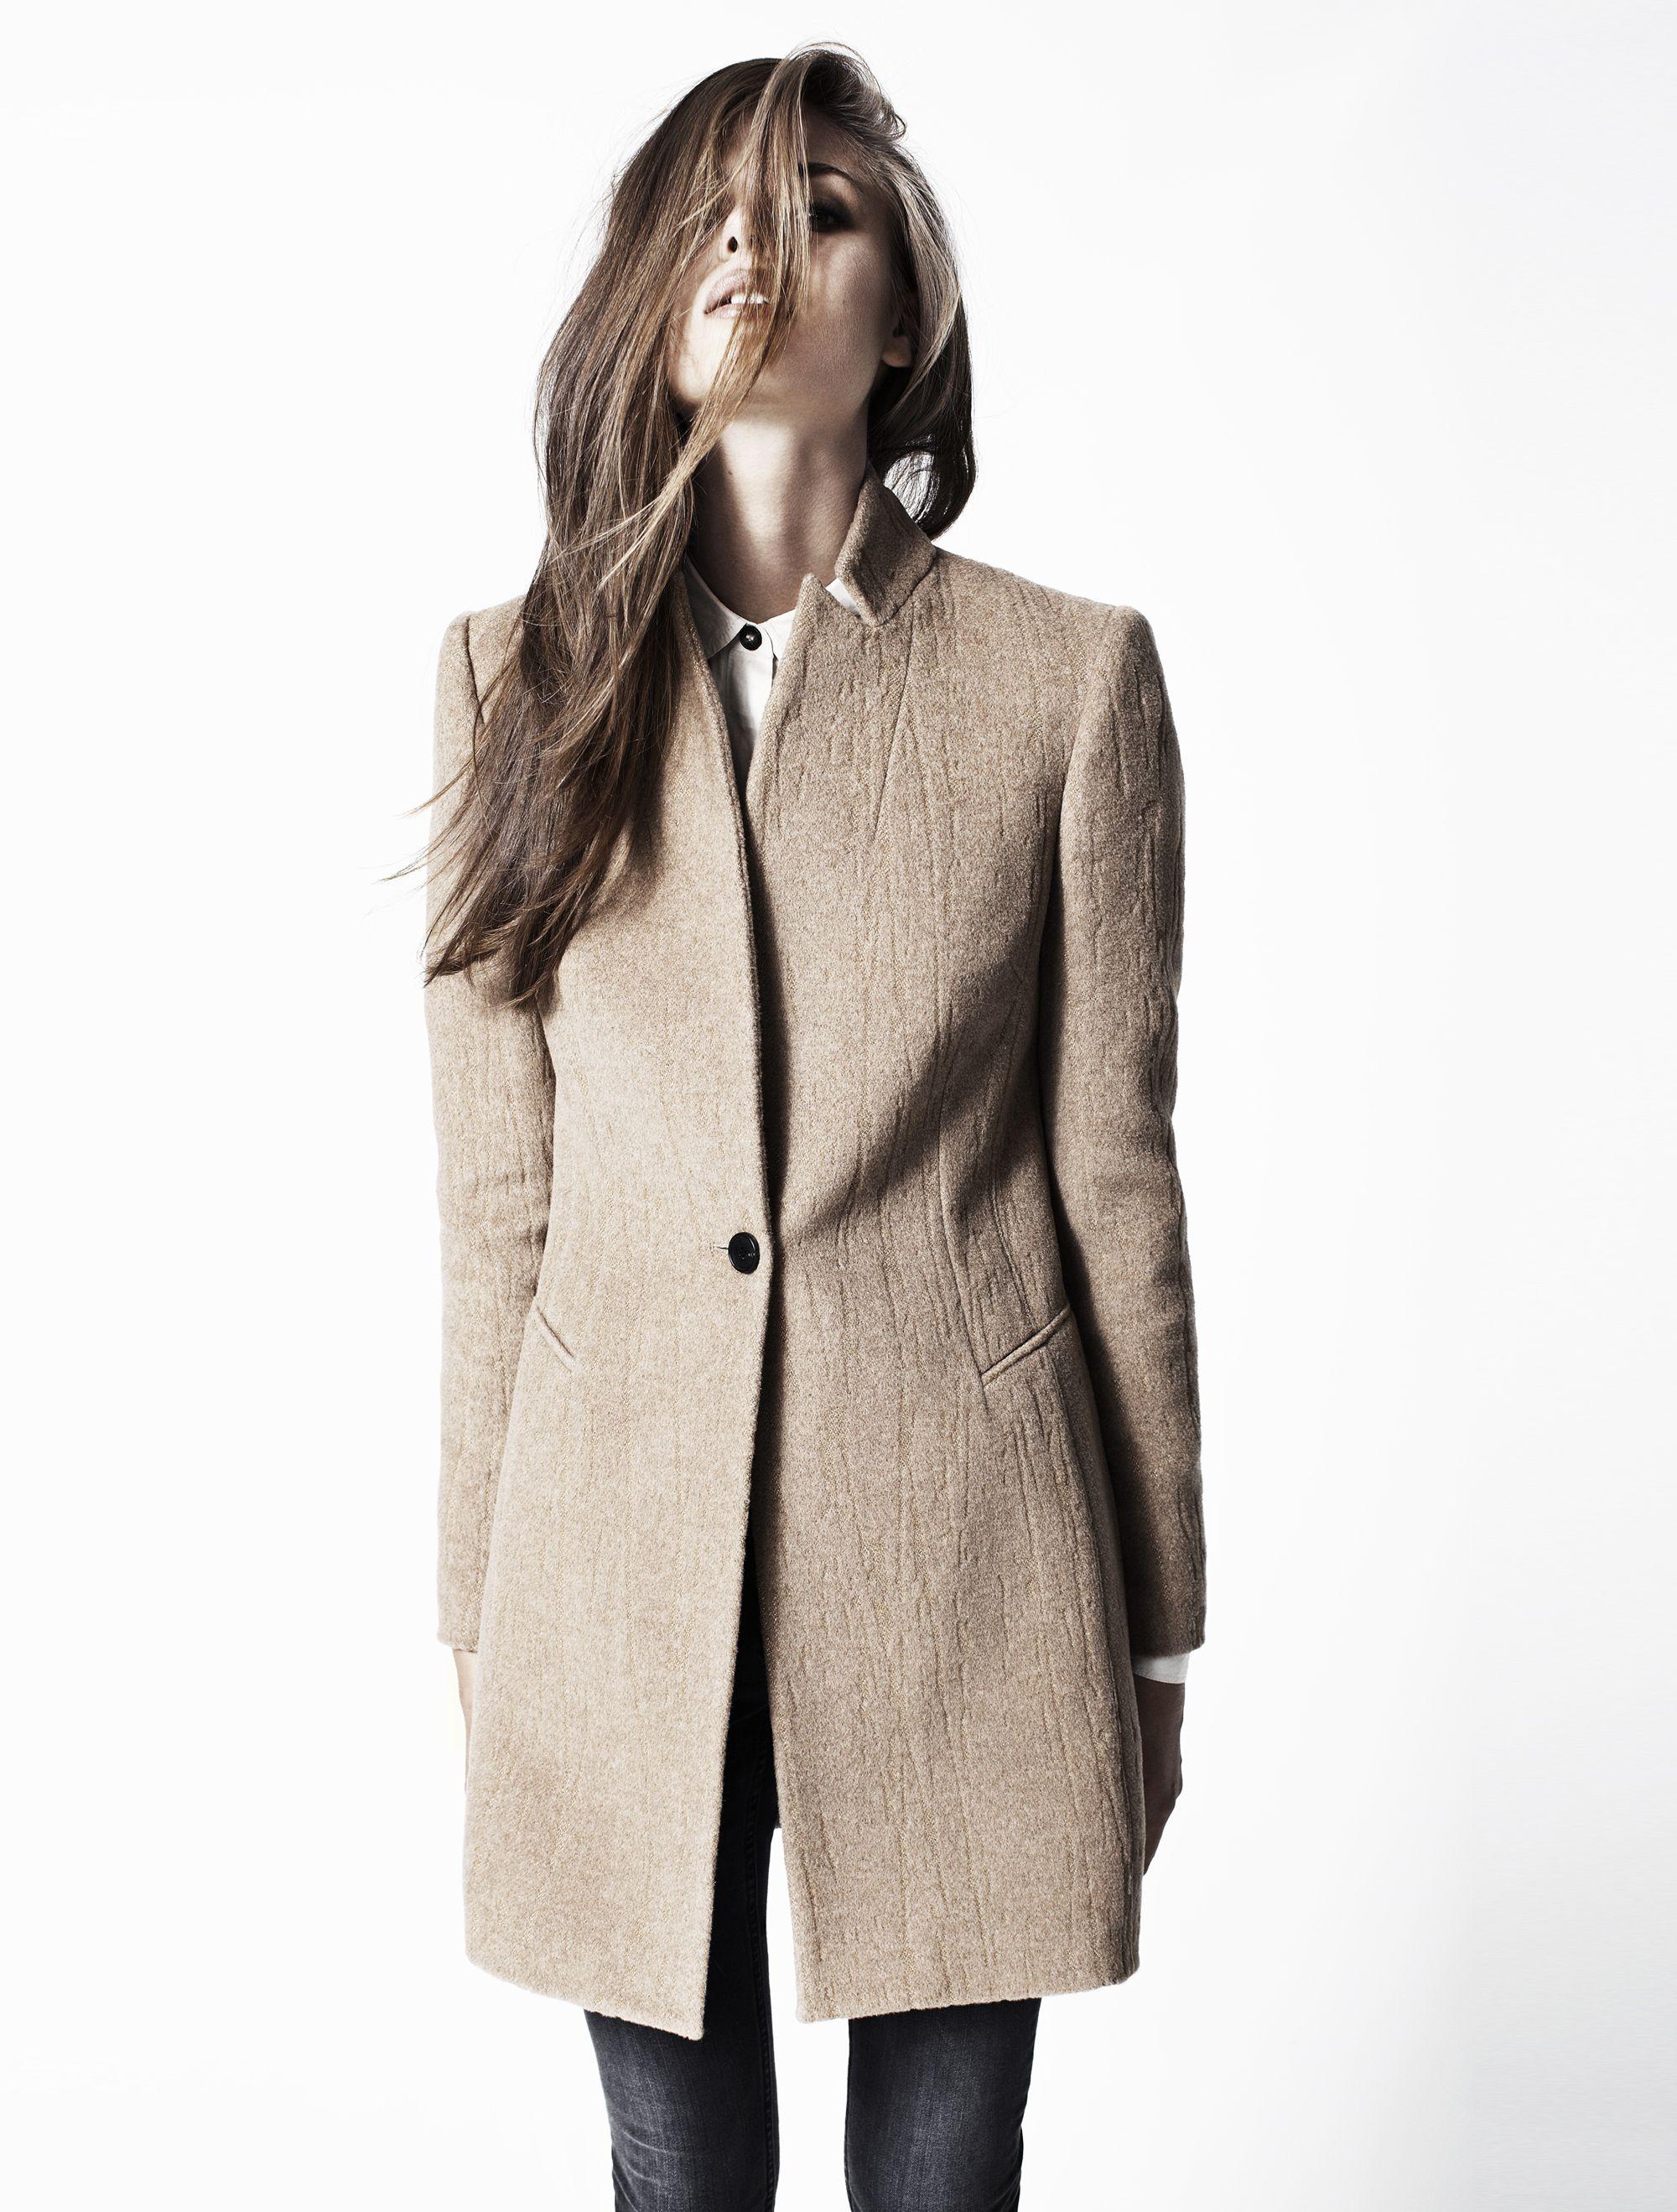 All Saints New Lookbook Covet Fashion Coats For